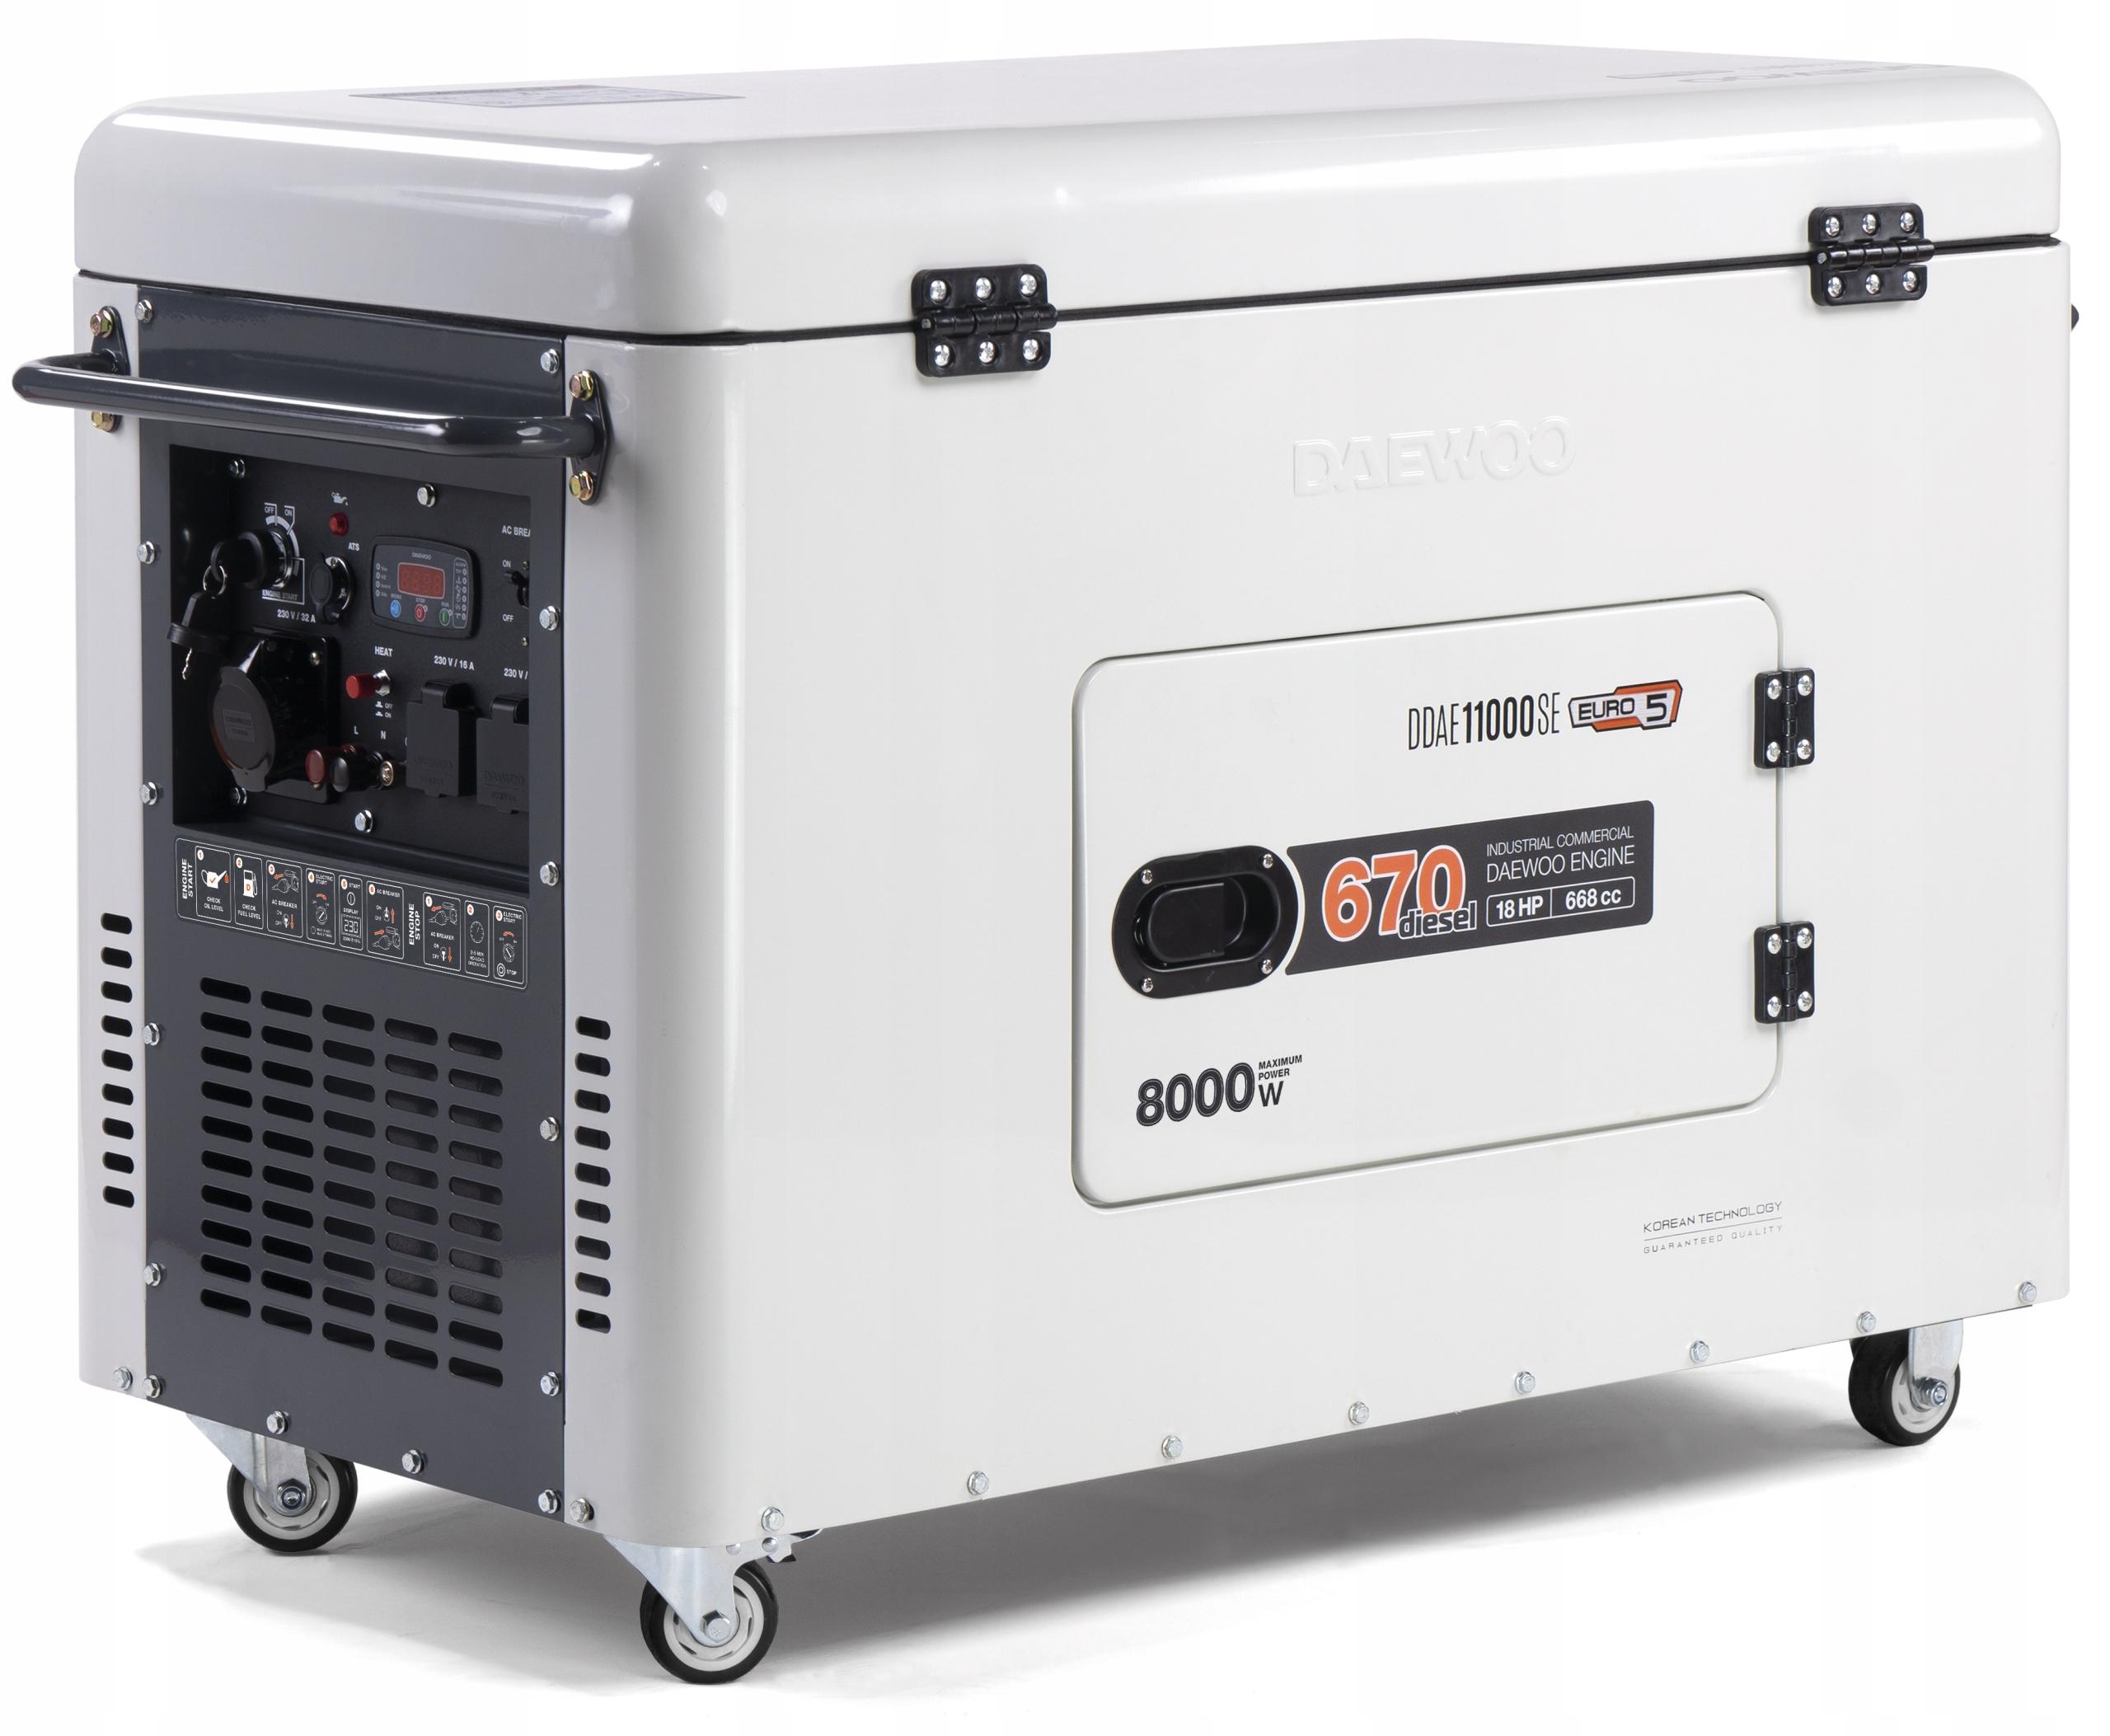 Дизель-генераторная установка DAEWOO DDAE 11000SE